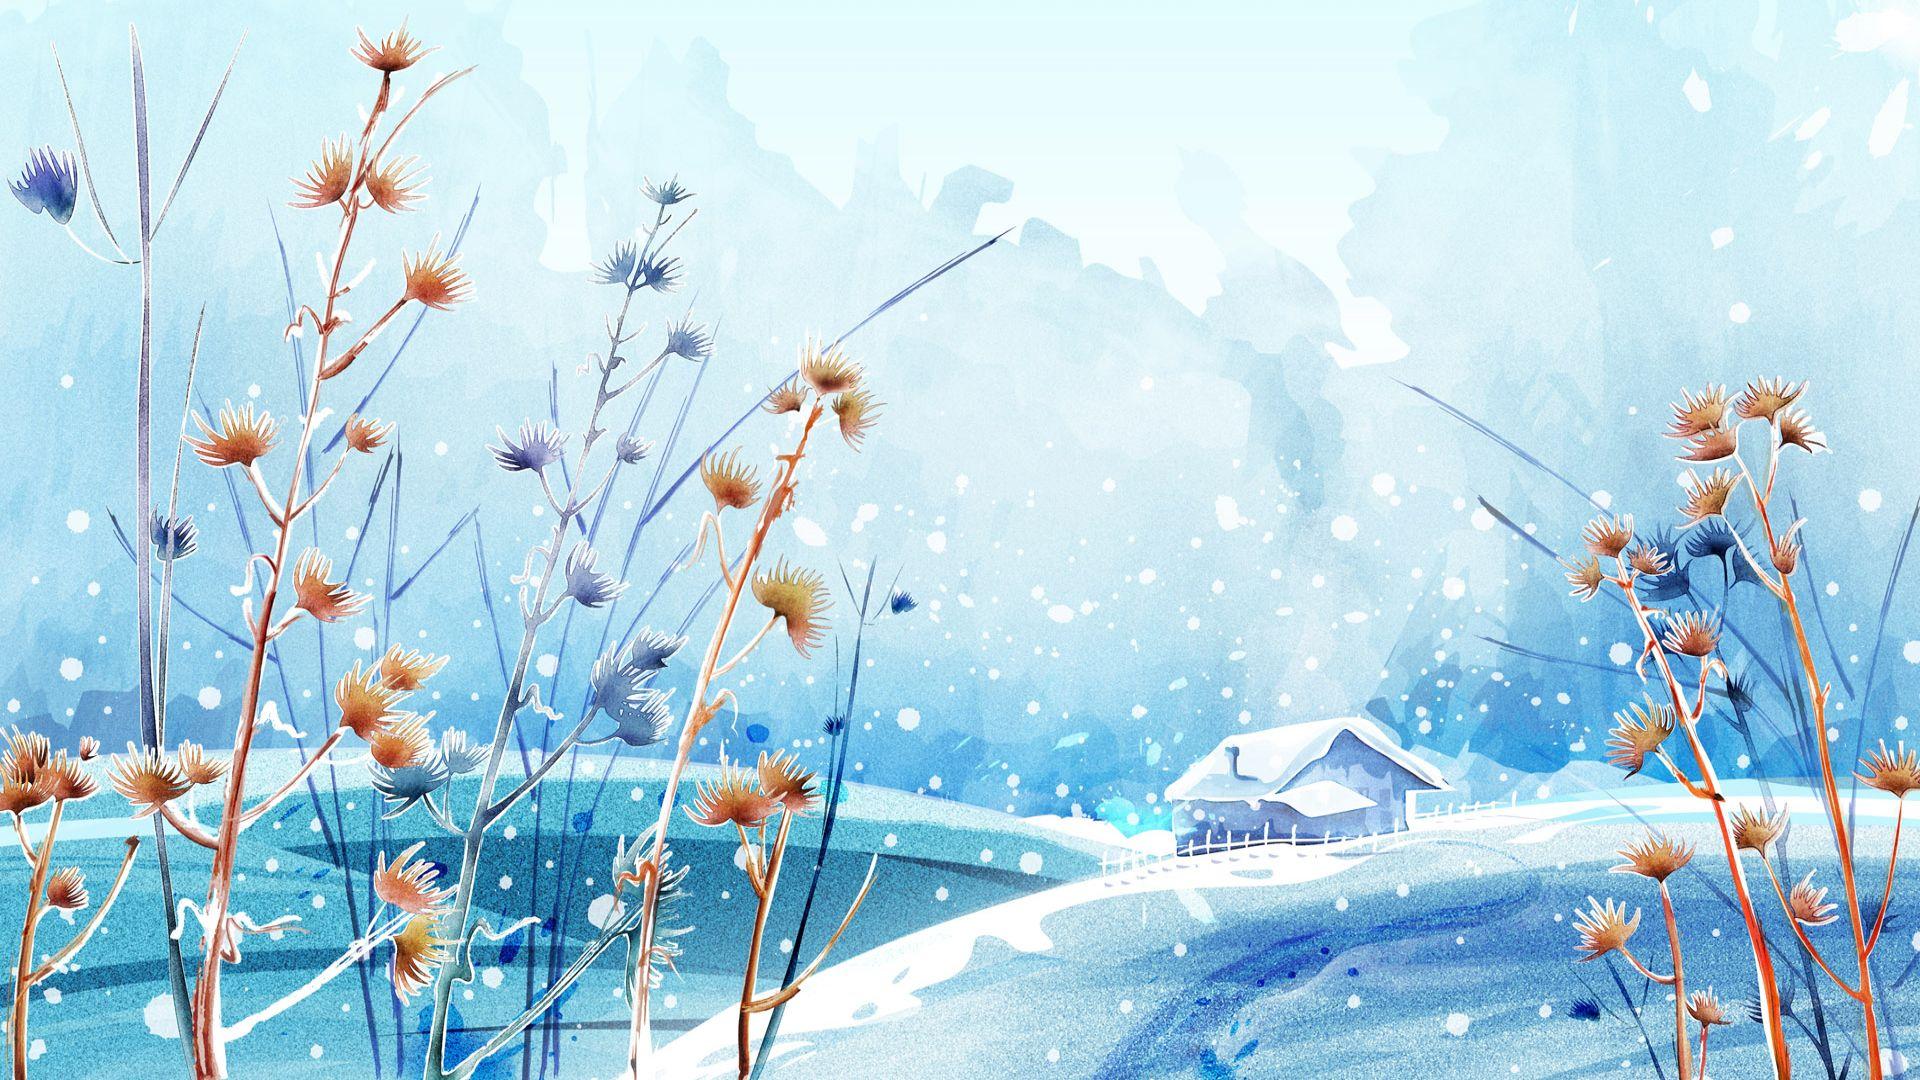 Beautiful Winter Day Desktop Wallpaper 1920x1080